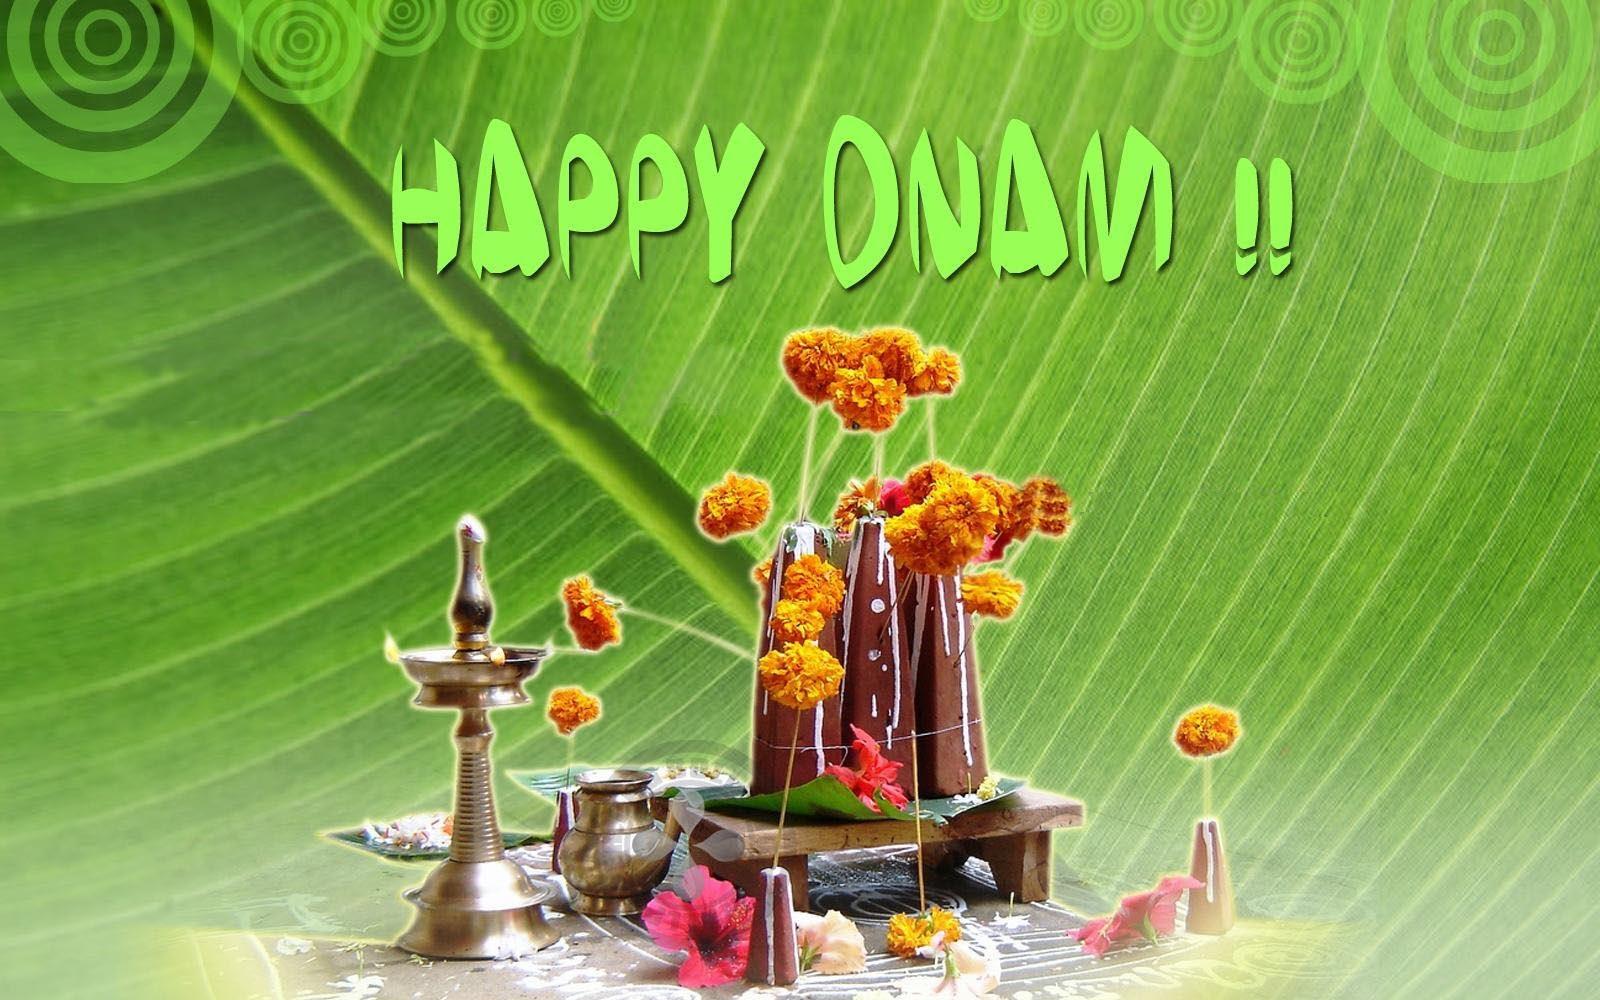 Khushi For Life Wish You A Happy Onam Happy Onam Greeting Cards